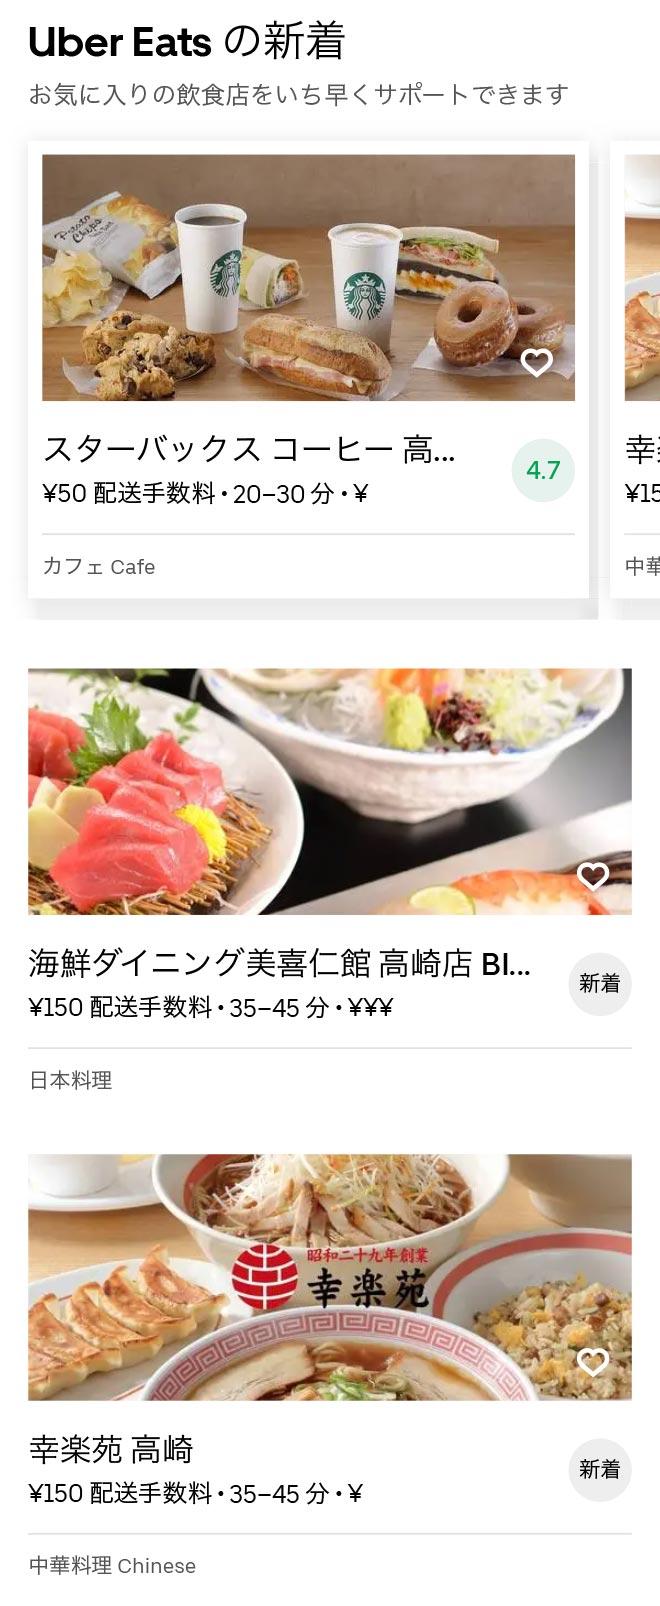 Takasaki menu 2010 02